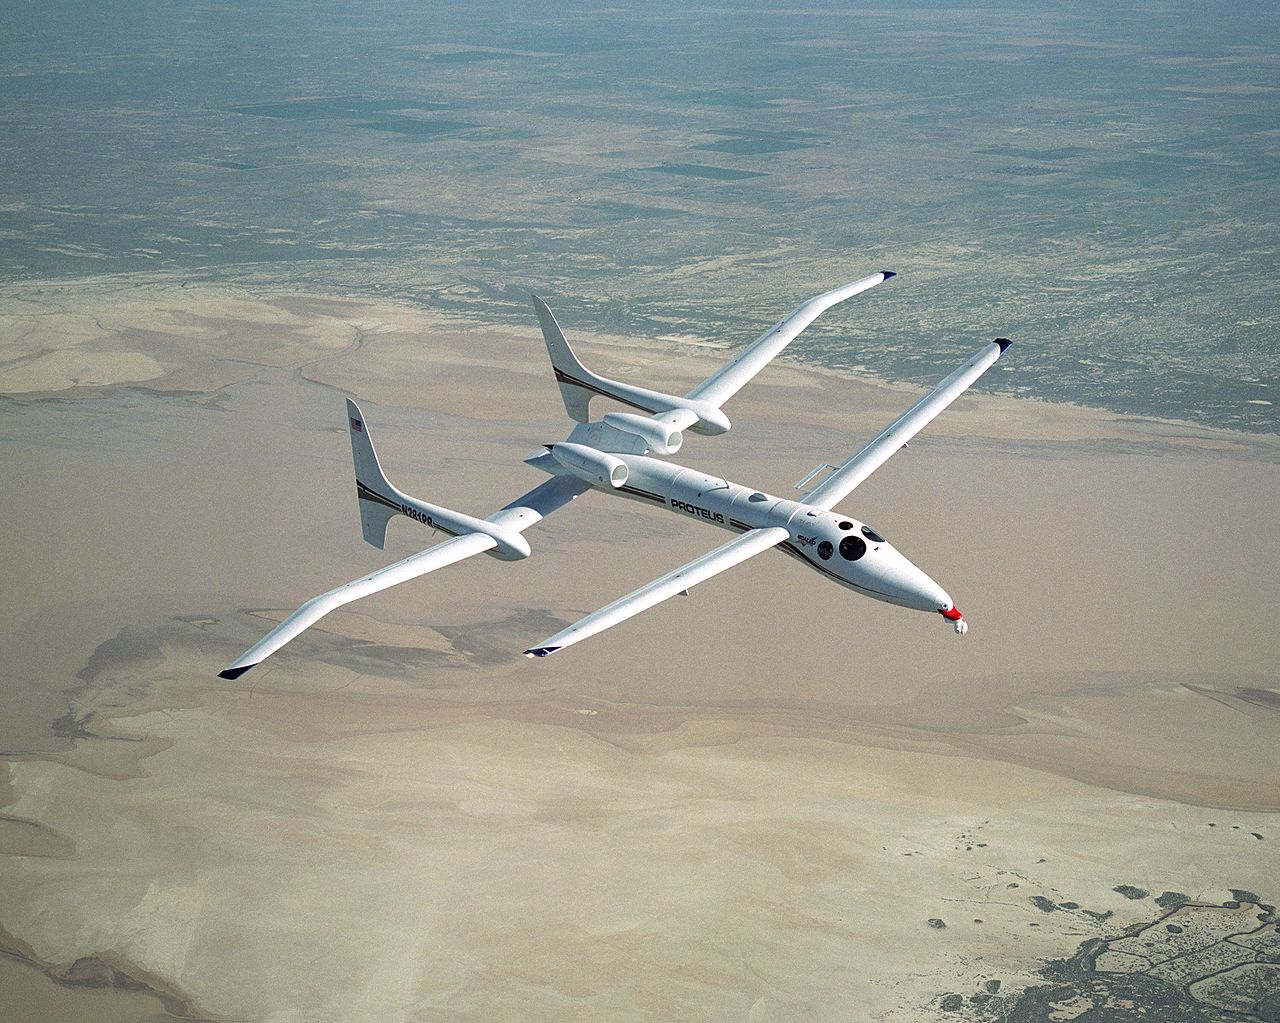 Scaled Composites Proteus in flight 1.jpg